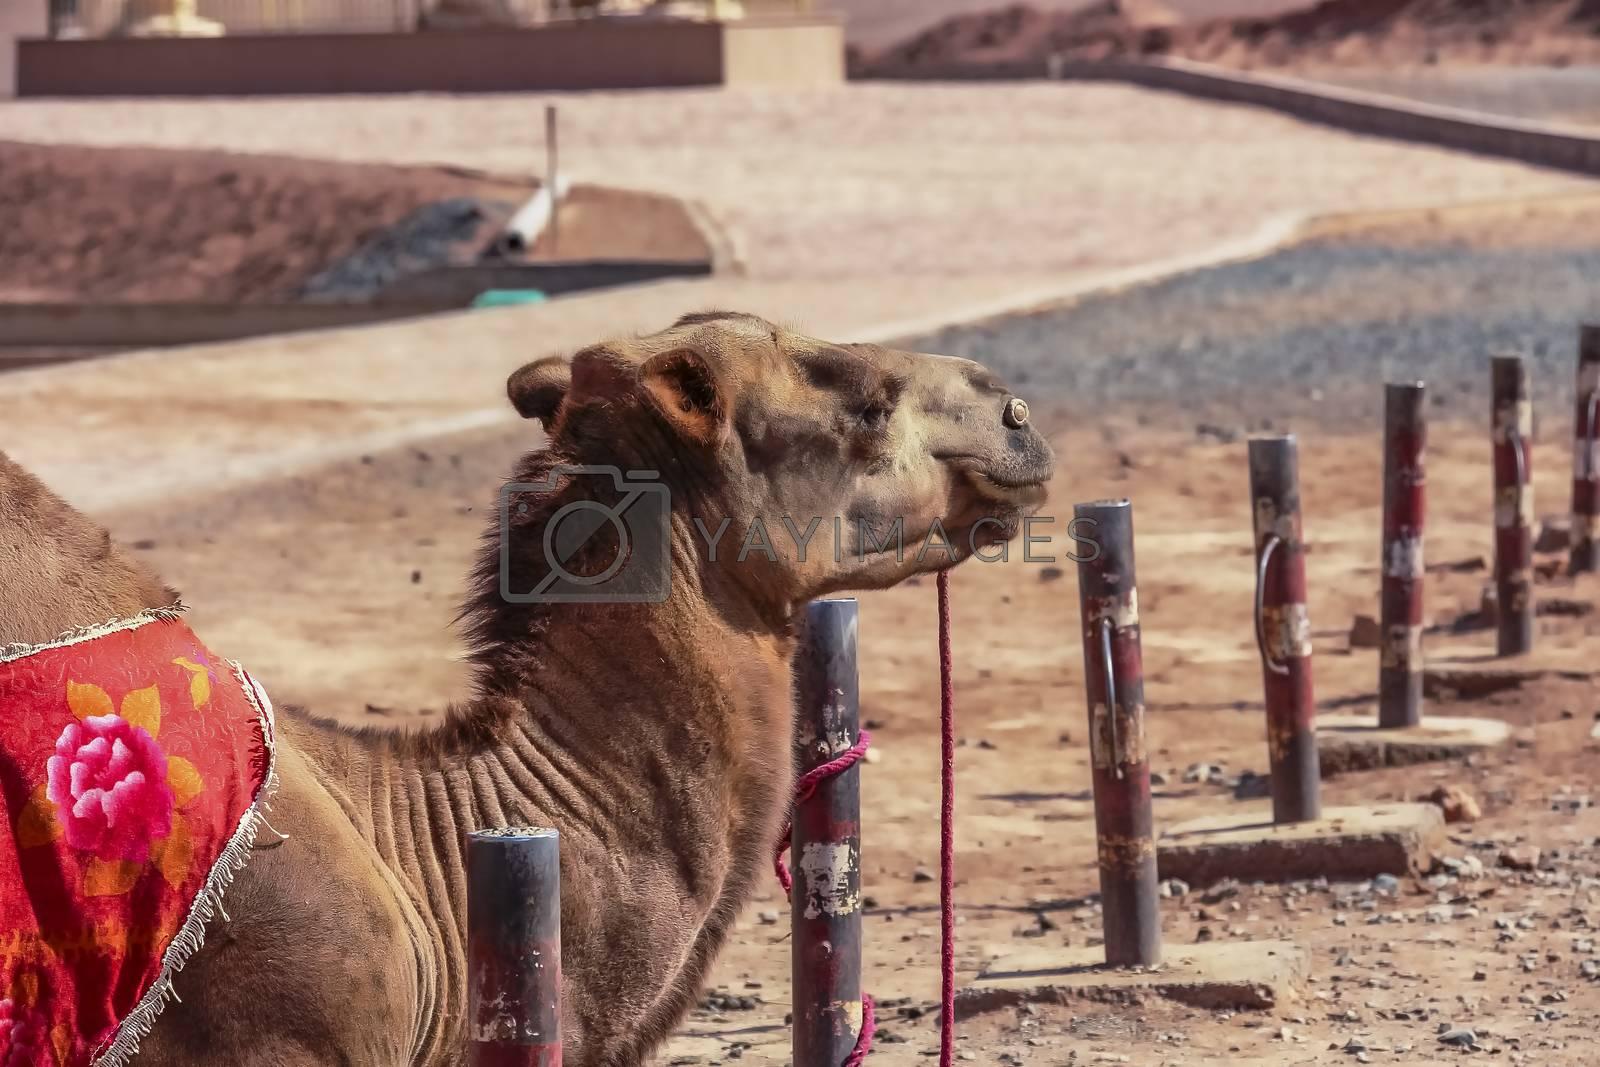 Northern Xinjiang Bactrian Camel at the Flaming Mountains in Turpan, China